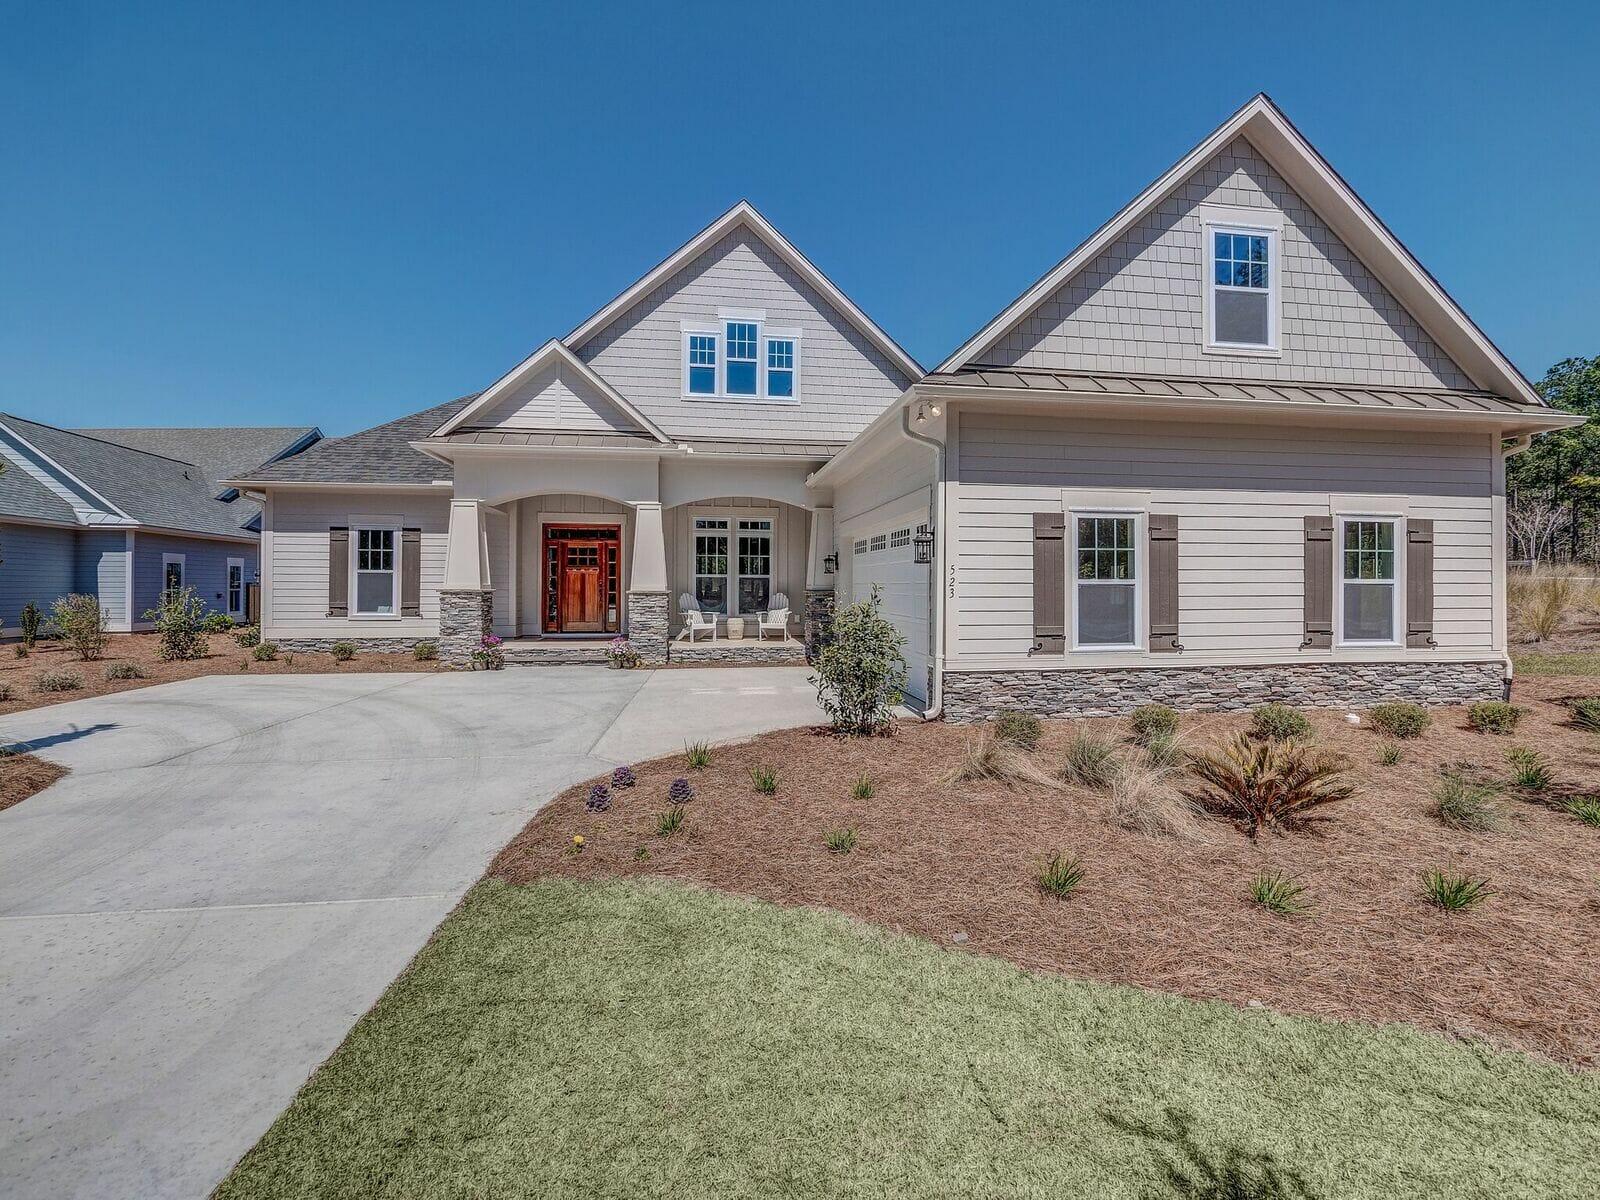 Logan Homes - Home Builders in South Carolina